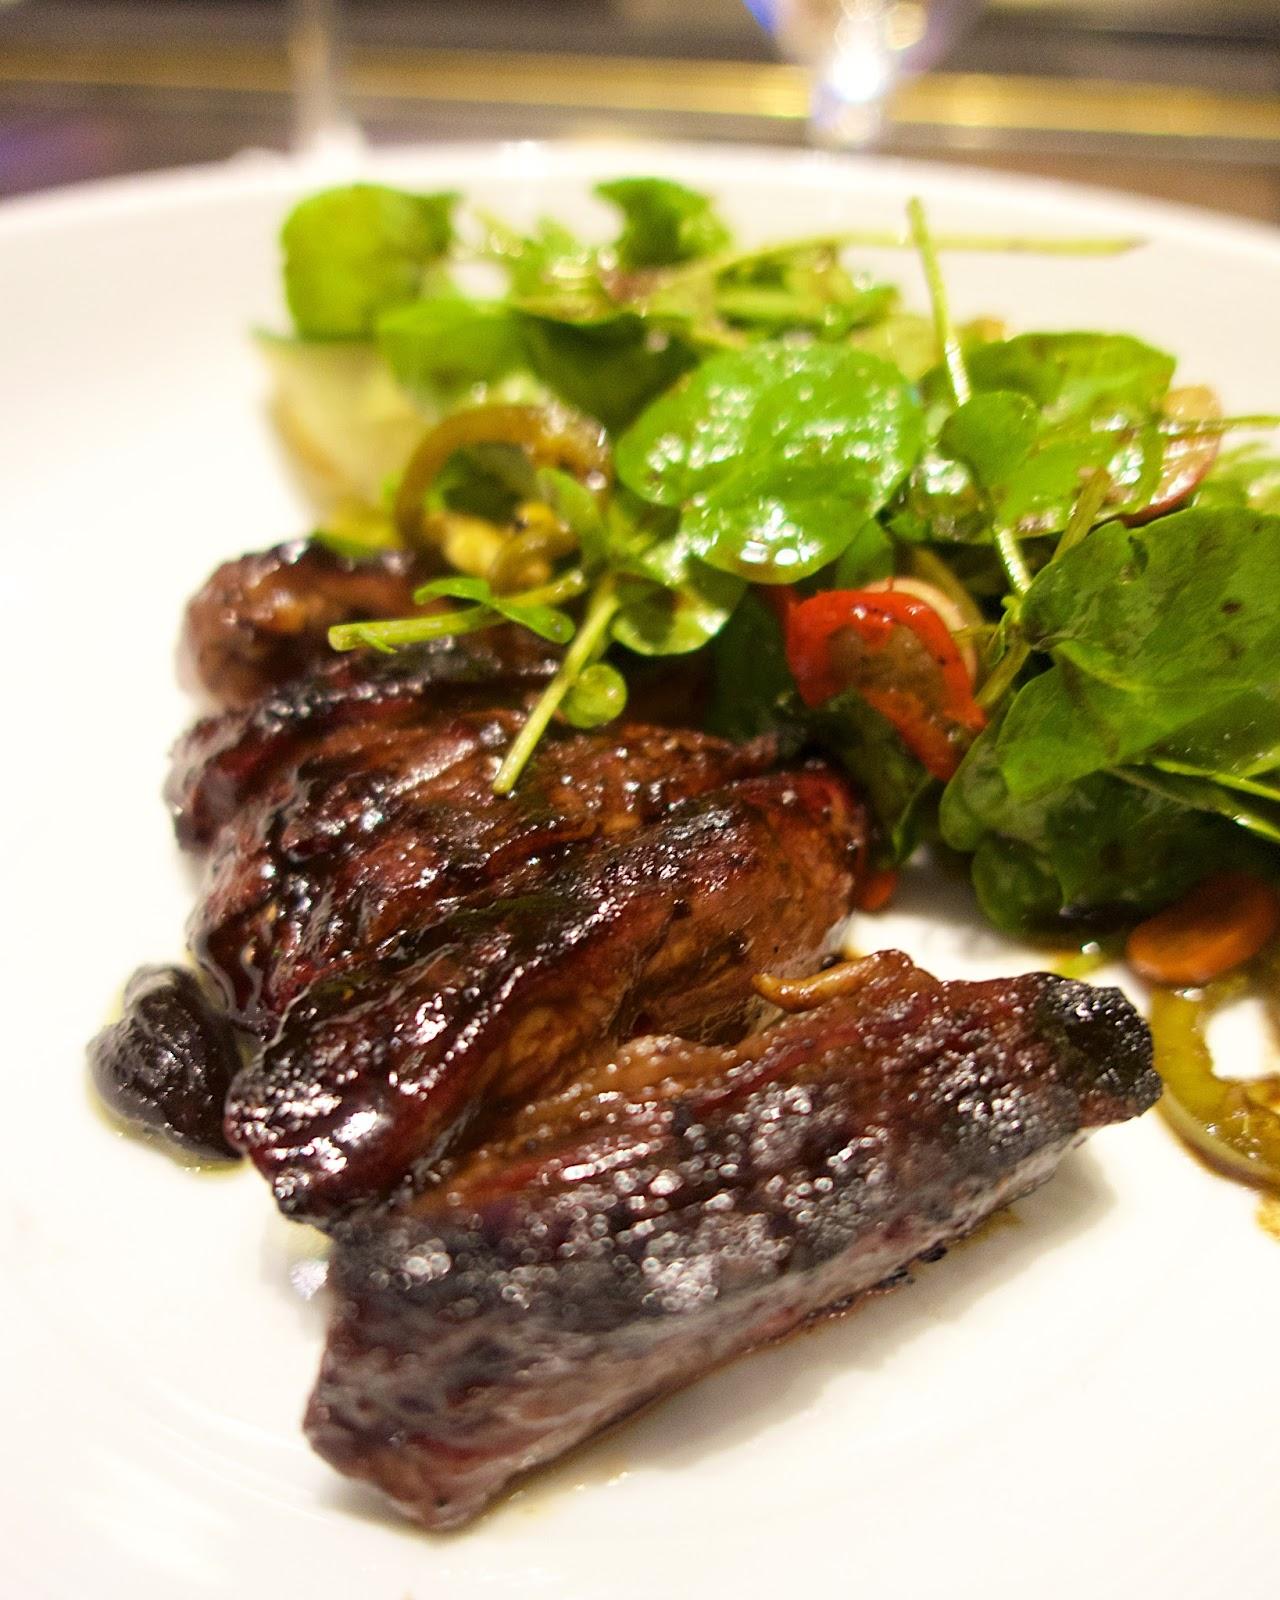 Tom Colicchio's Heritage Steak - soy-chili glazed skirt steak skewers